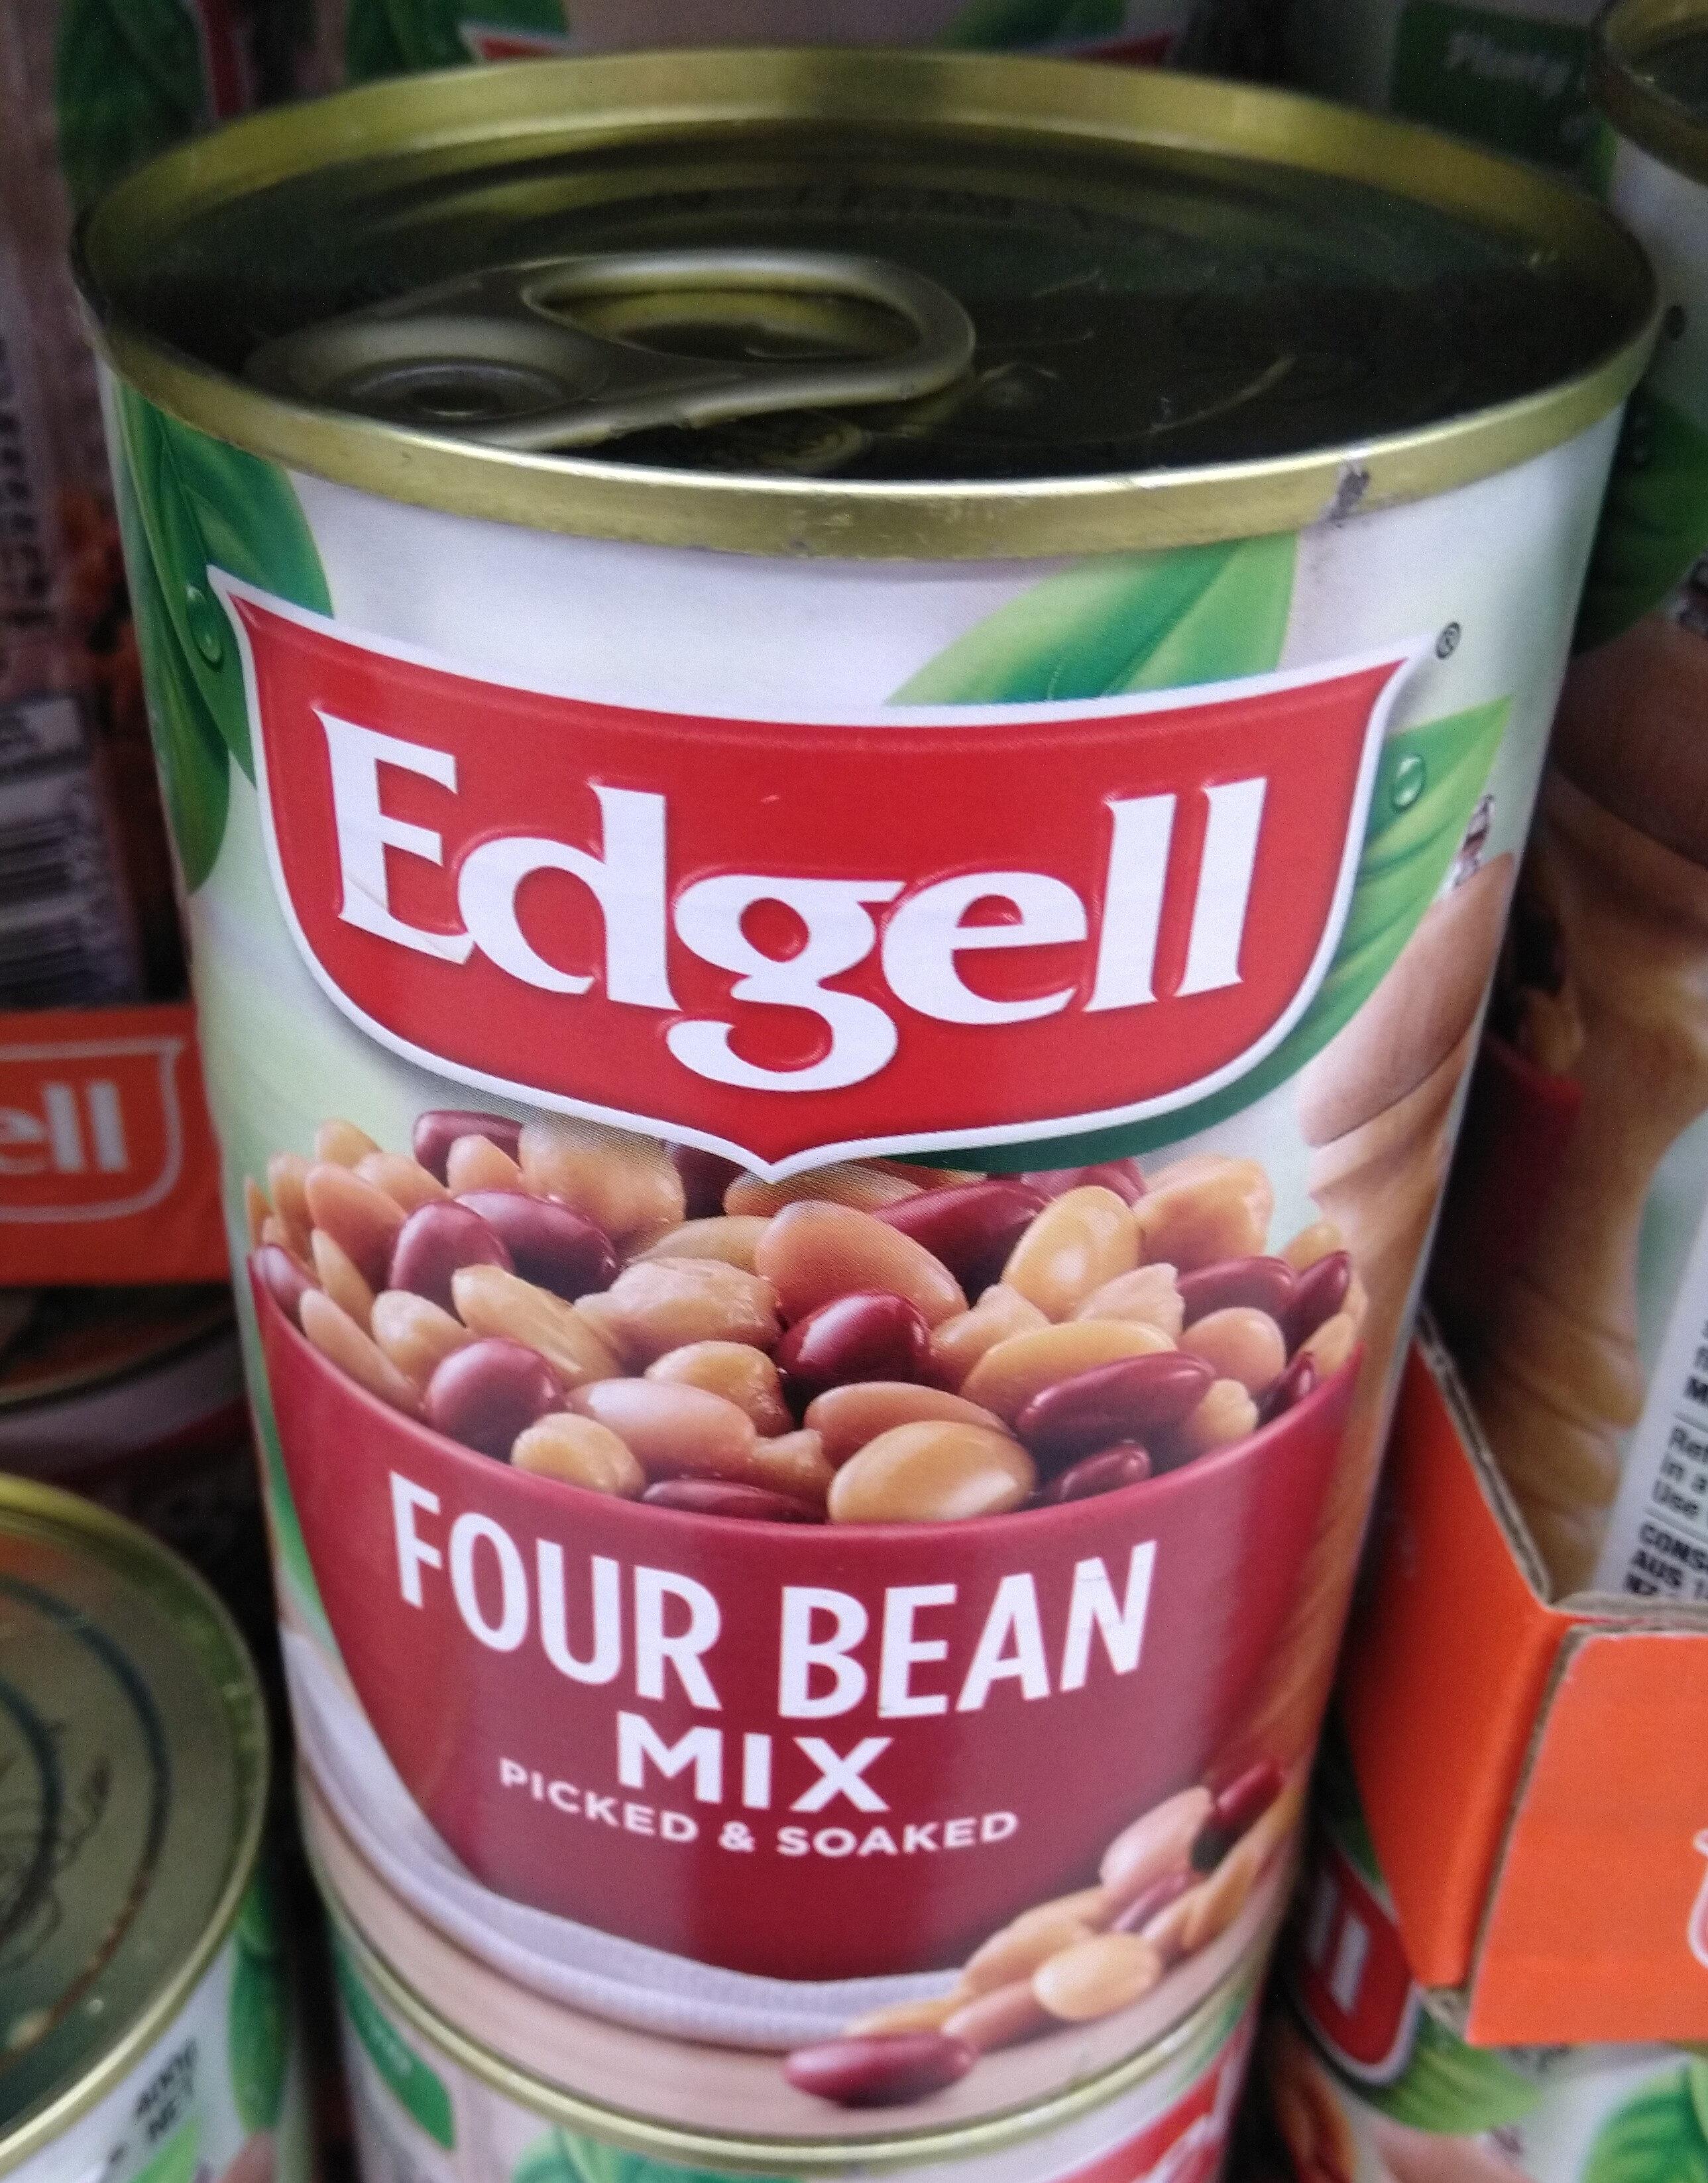 Edgell Four Bean Mix - Product - en